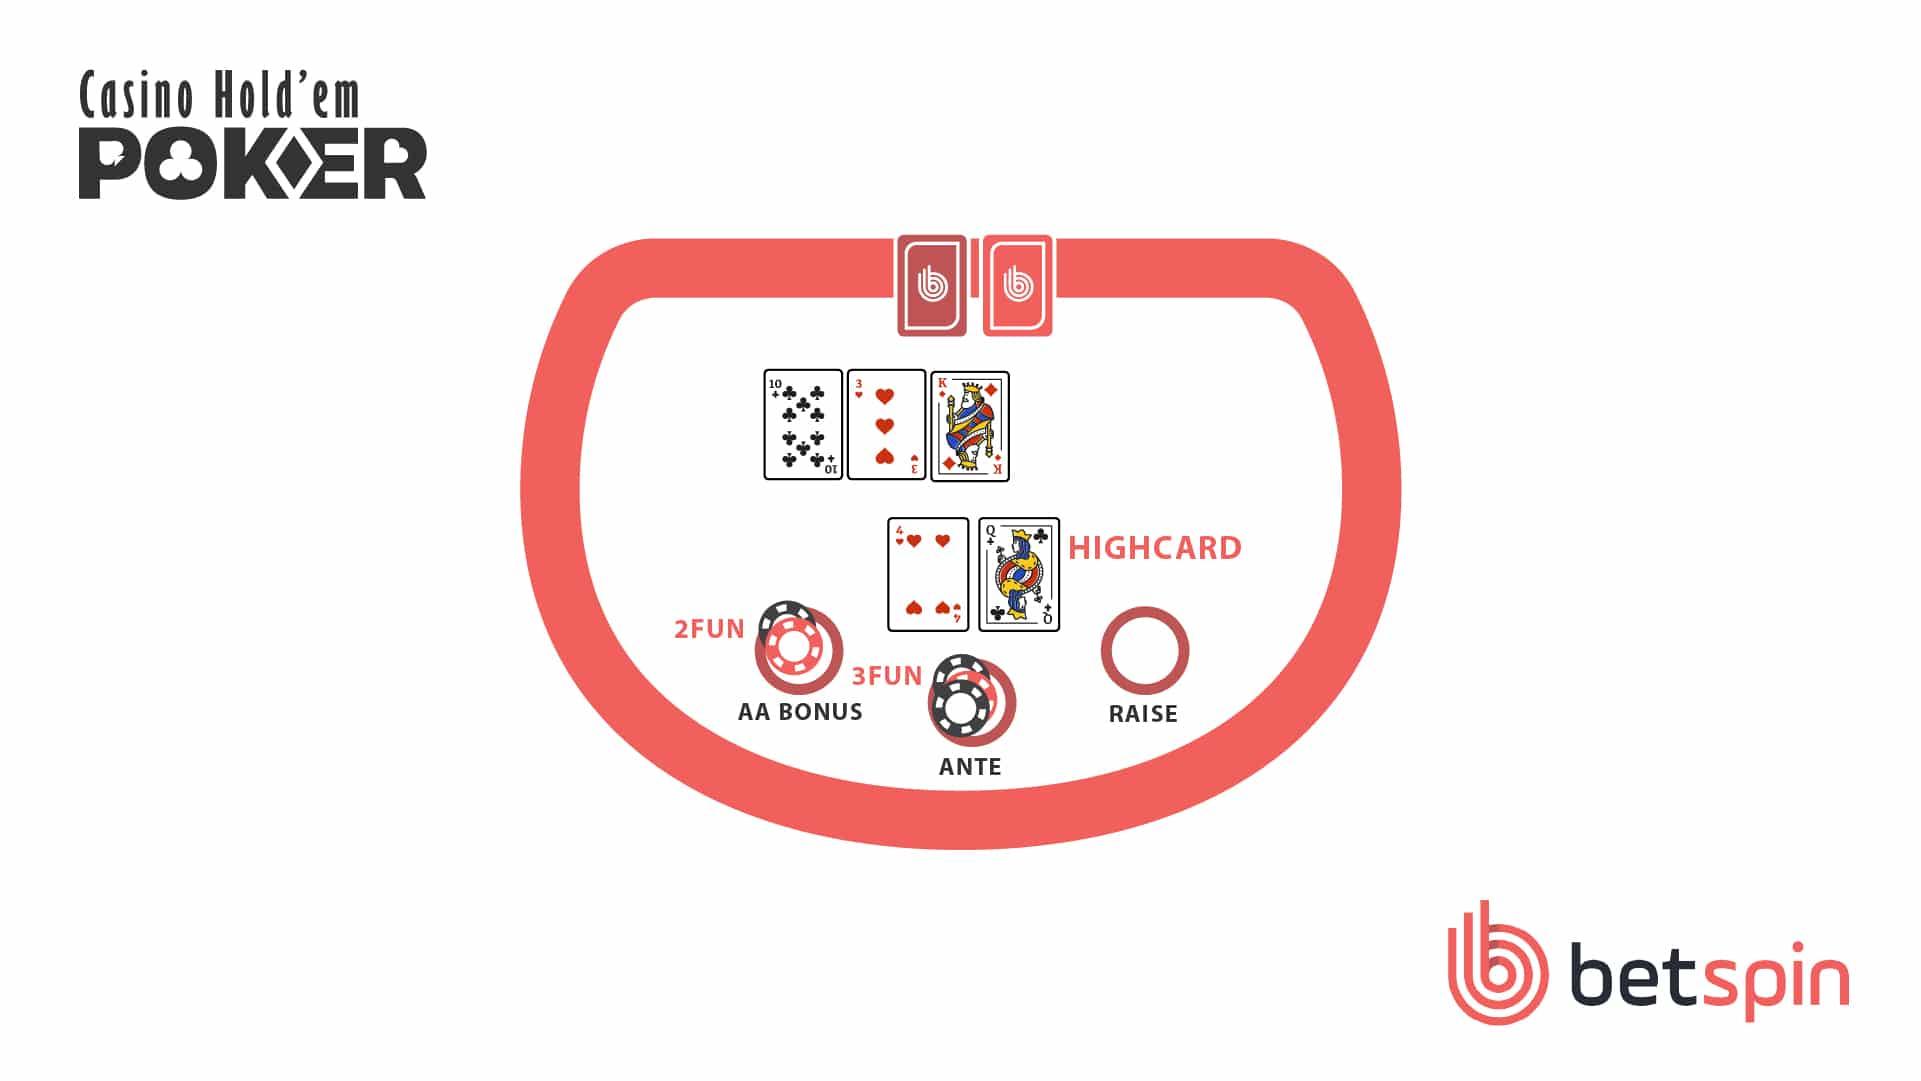 Casino Holdem Step 3